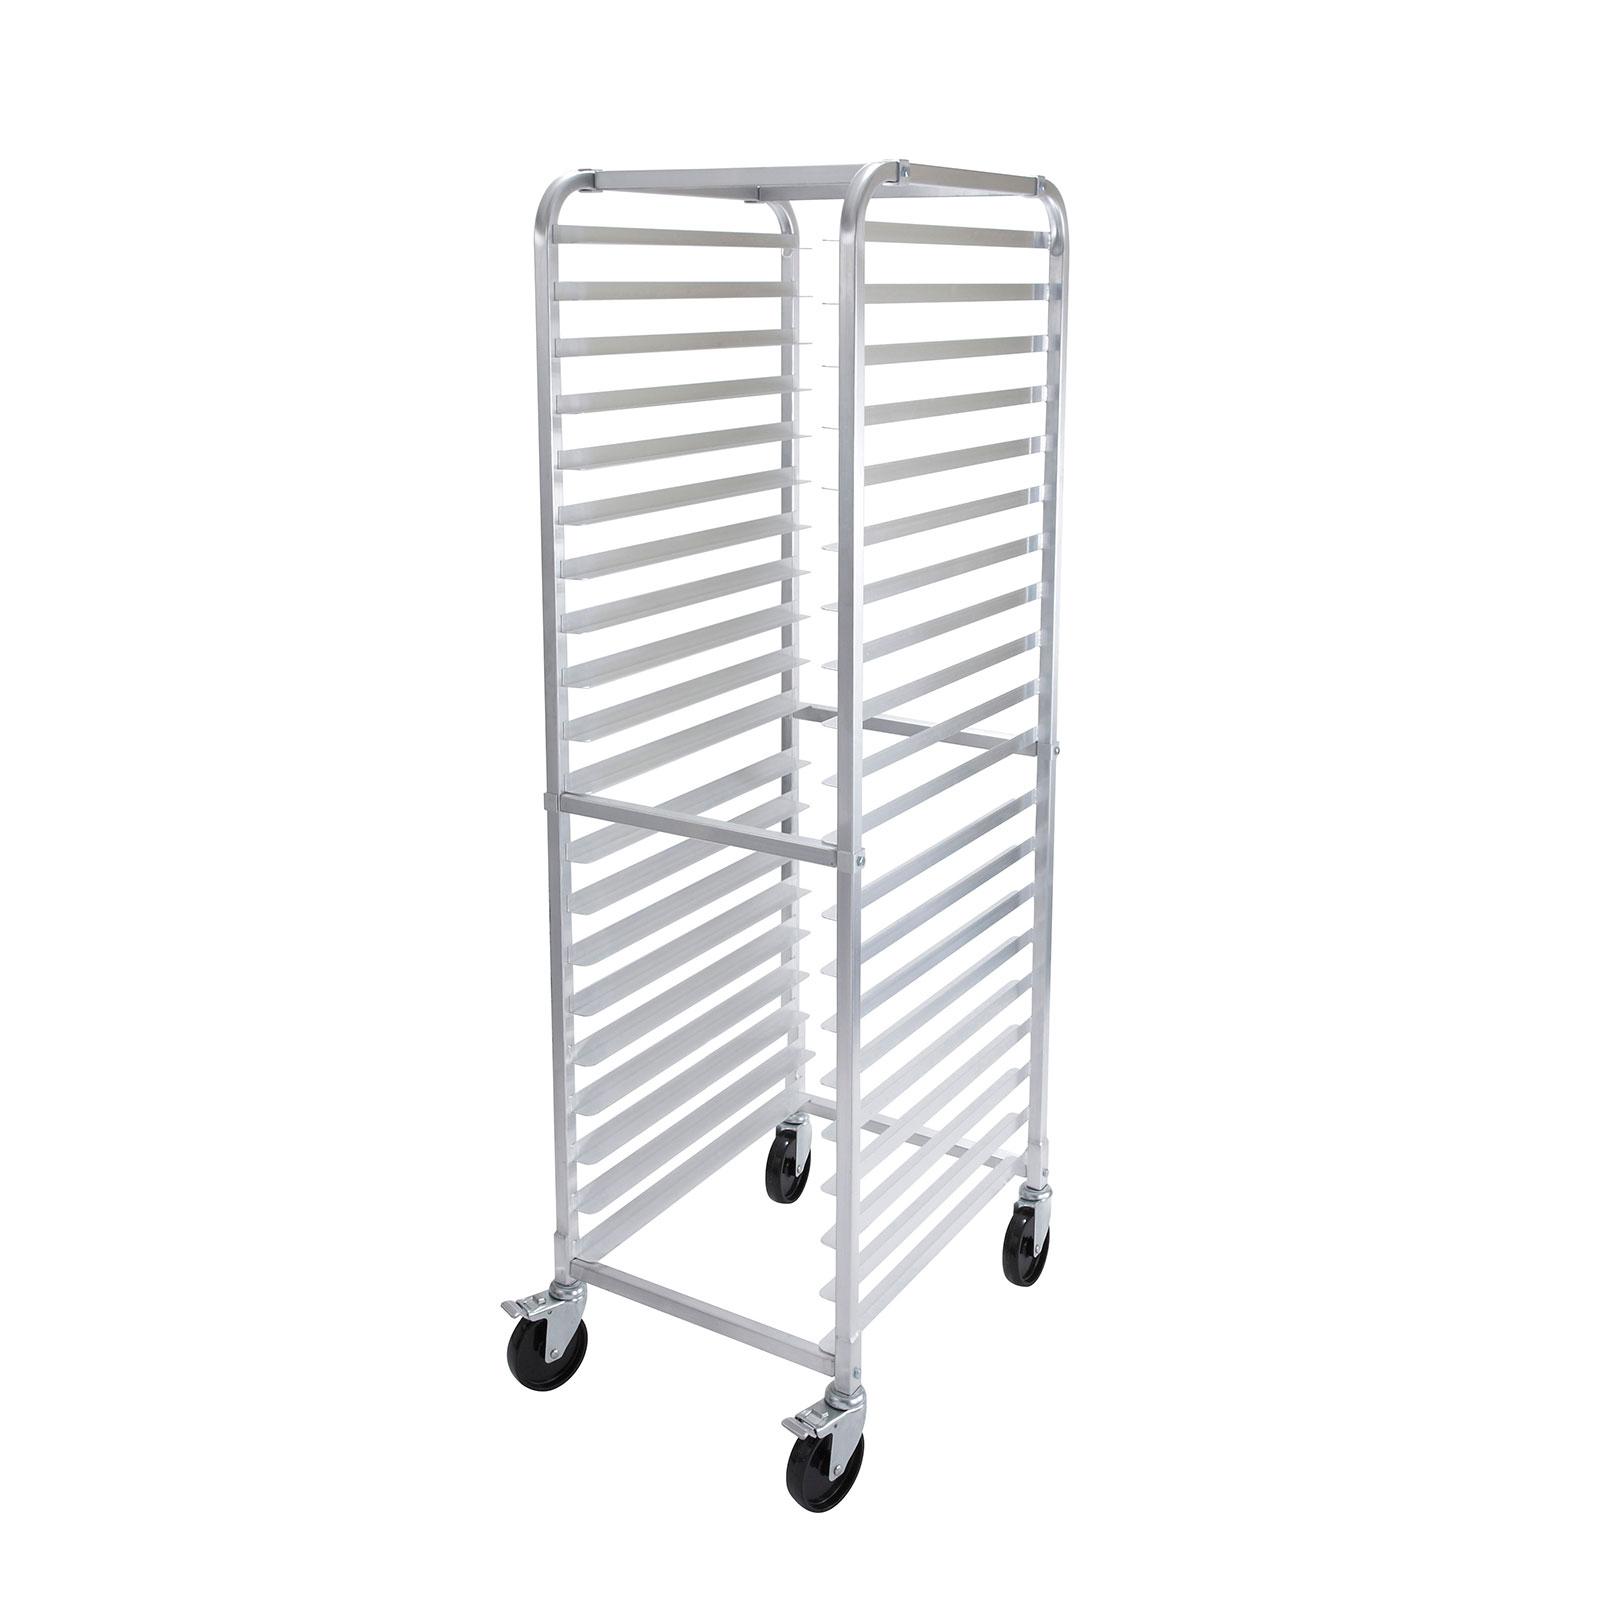 Winco ALRK-20BK pan rack, universal